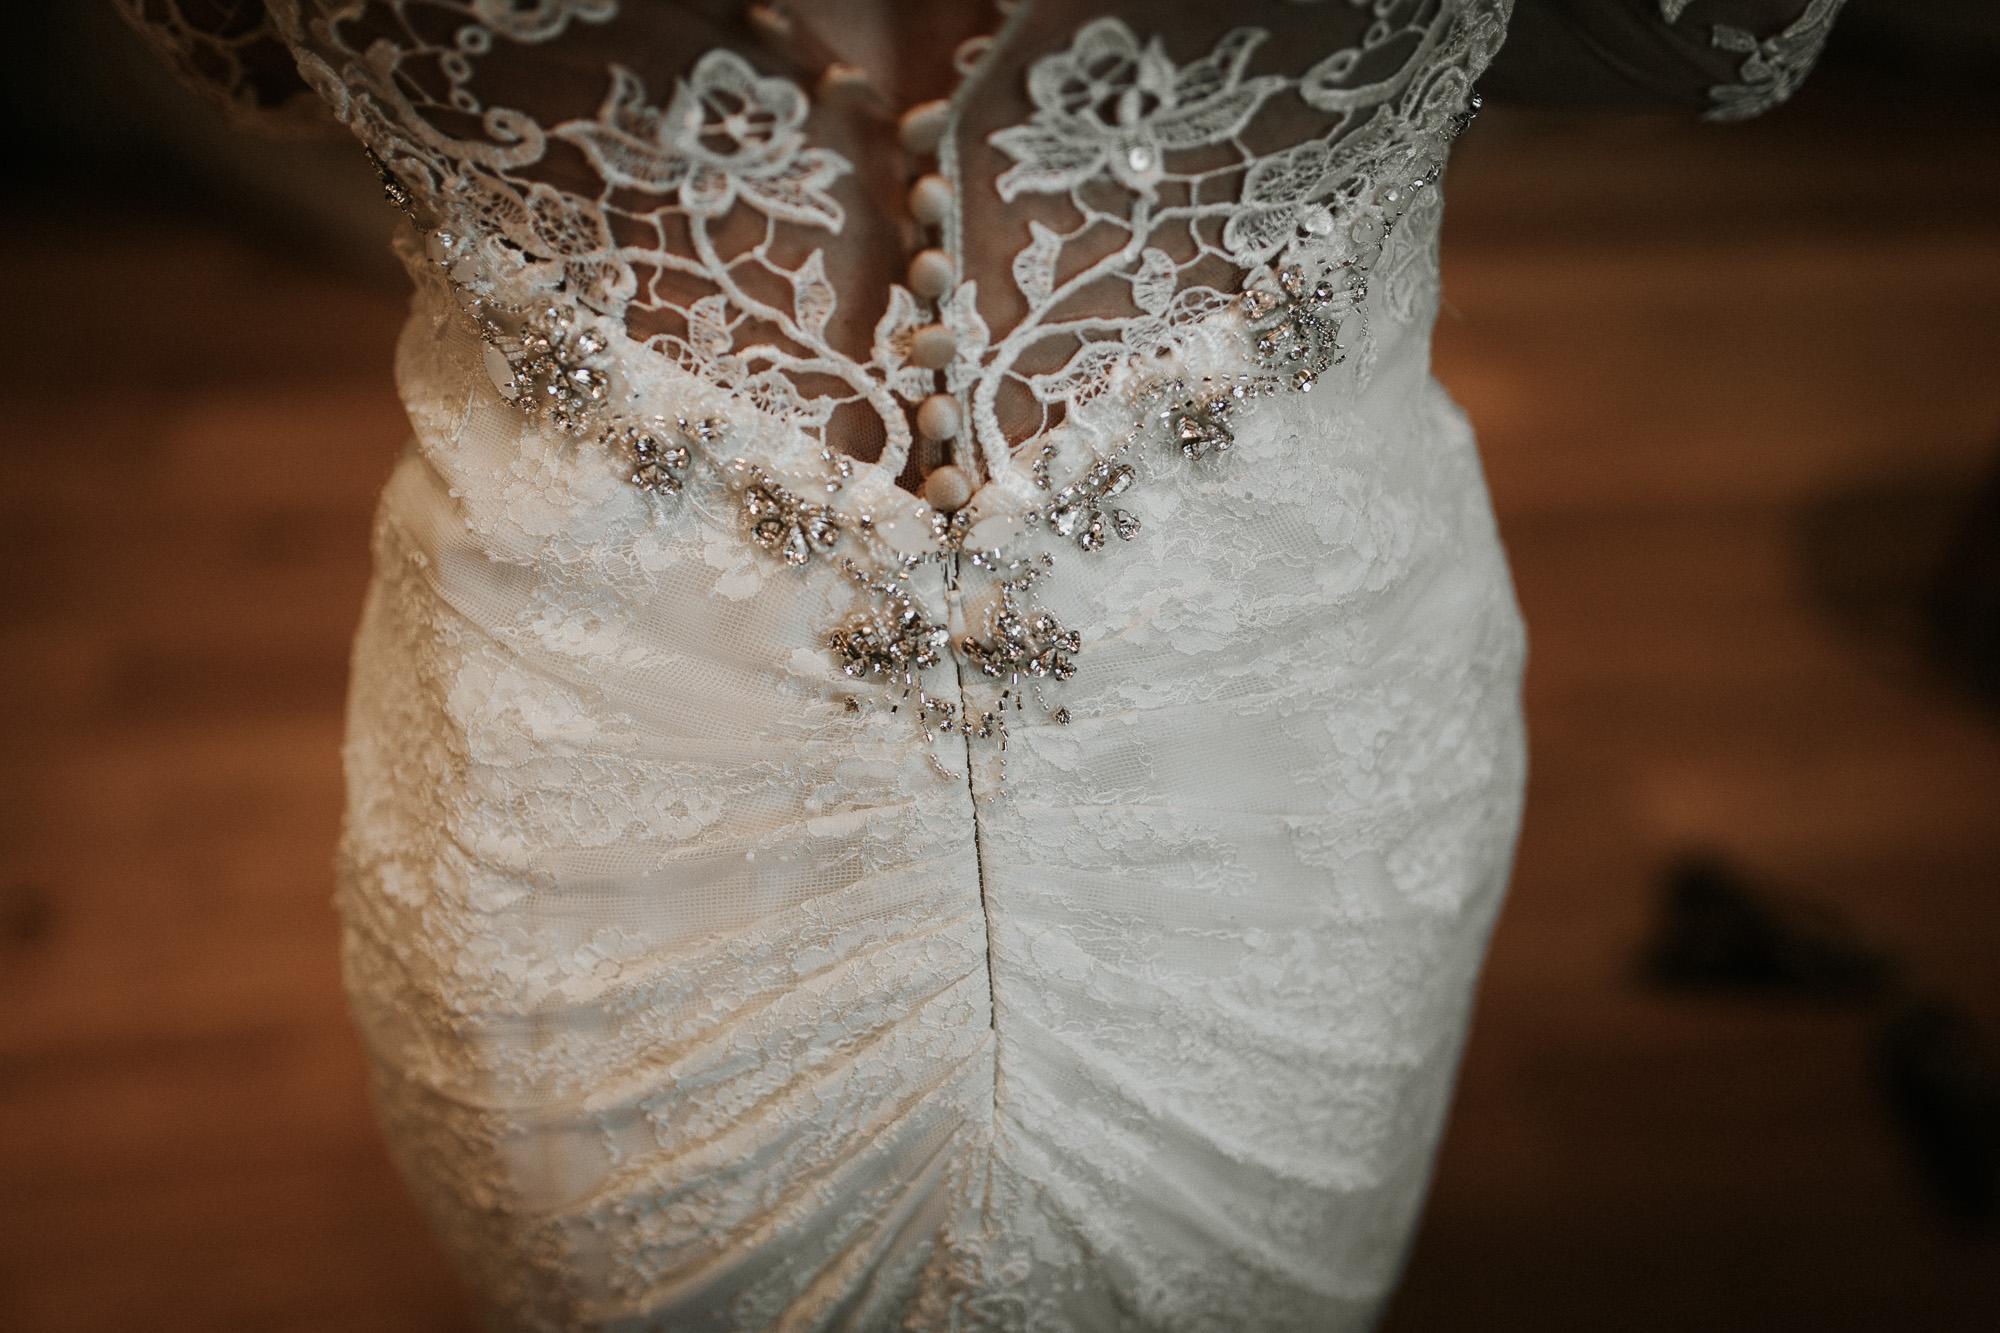 DanielaMarquardtPhotography_Hochzeitsfotograf_Düsseldorf_Köln_Mallorca_Bayern_Austria_Harz_Wedding_AileenundLennart_Weddingphotographer_Ibiza_Tuskany_Italien_Toskana_Portugal_Lissabon44